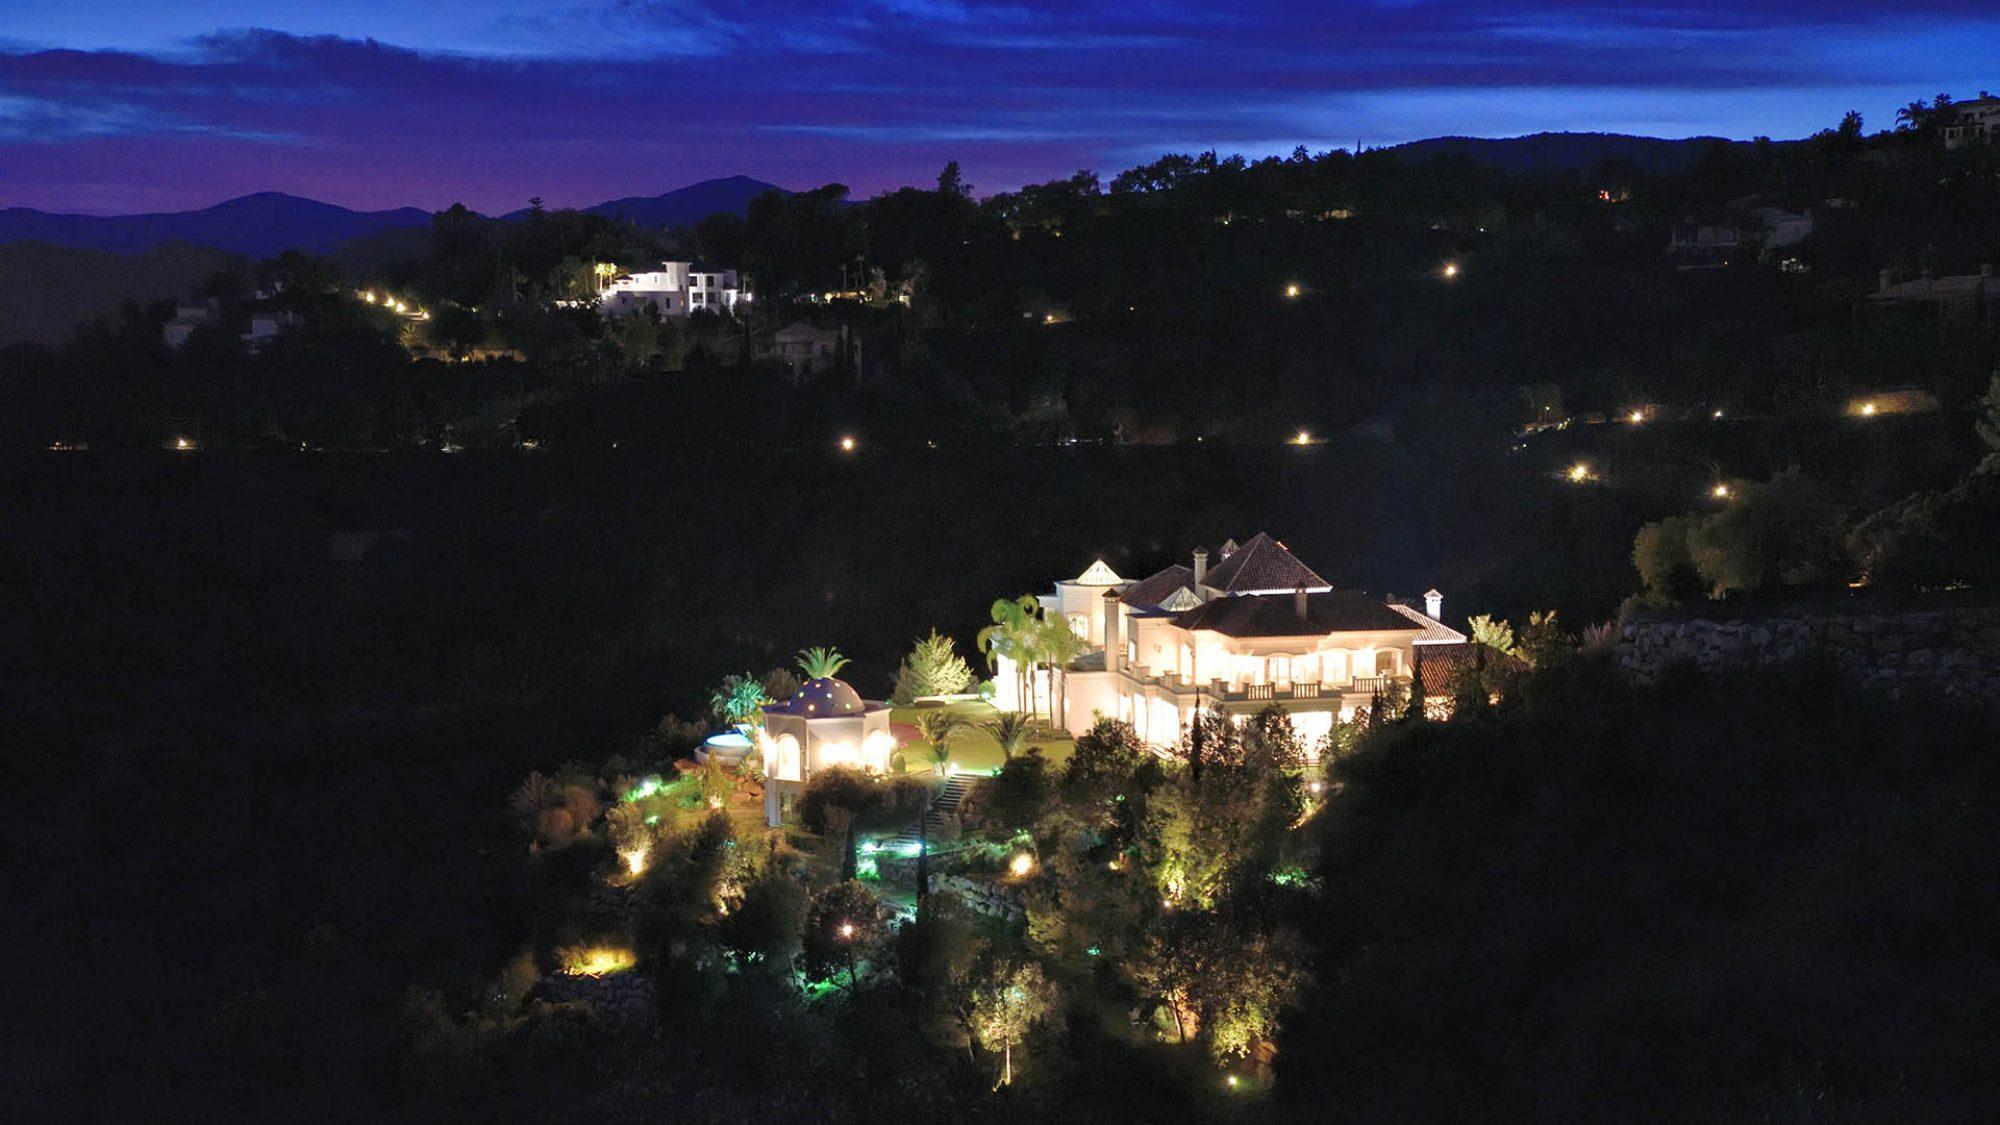 la zagaleta property for at night